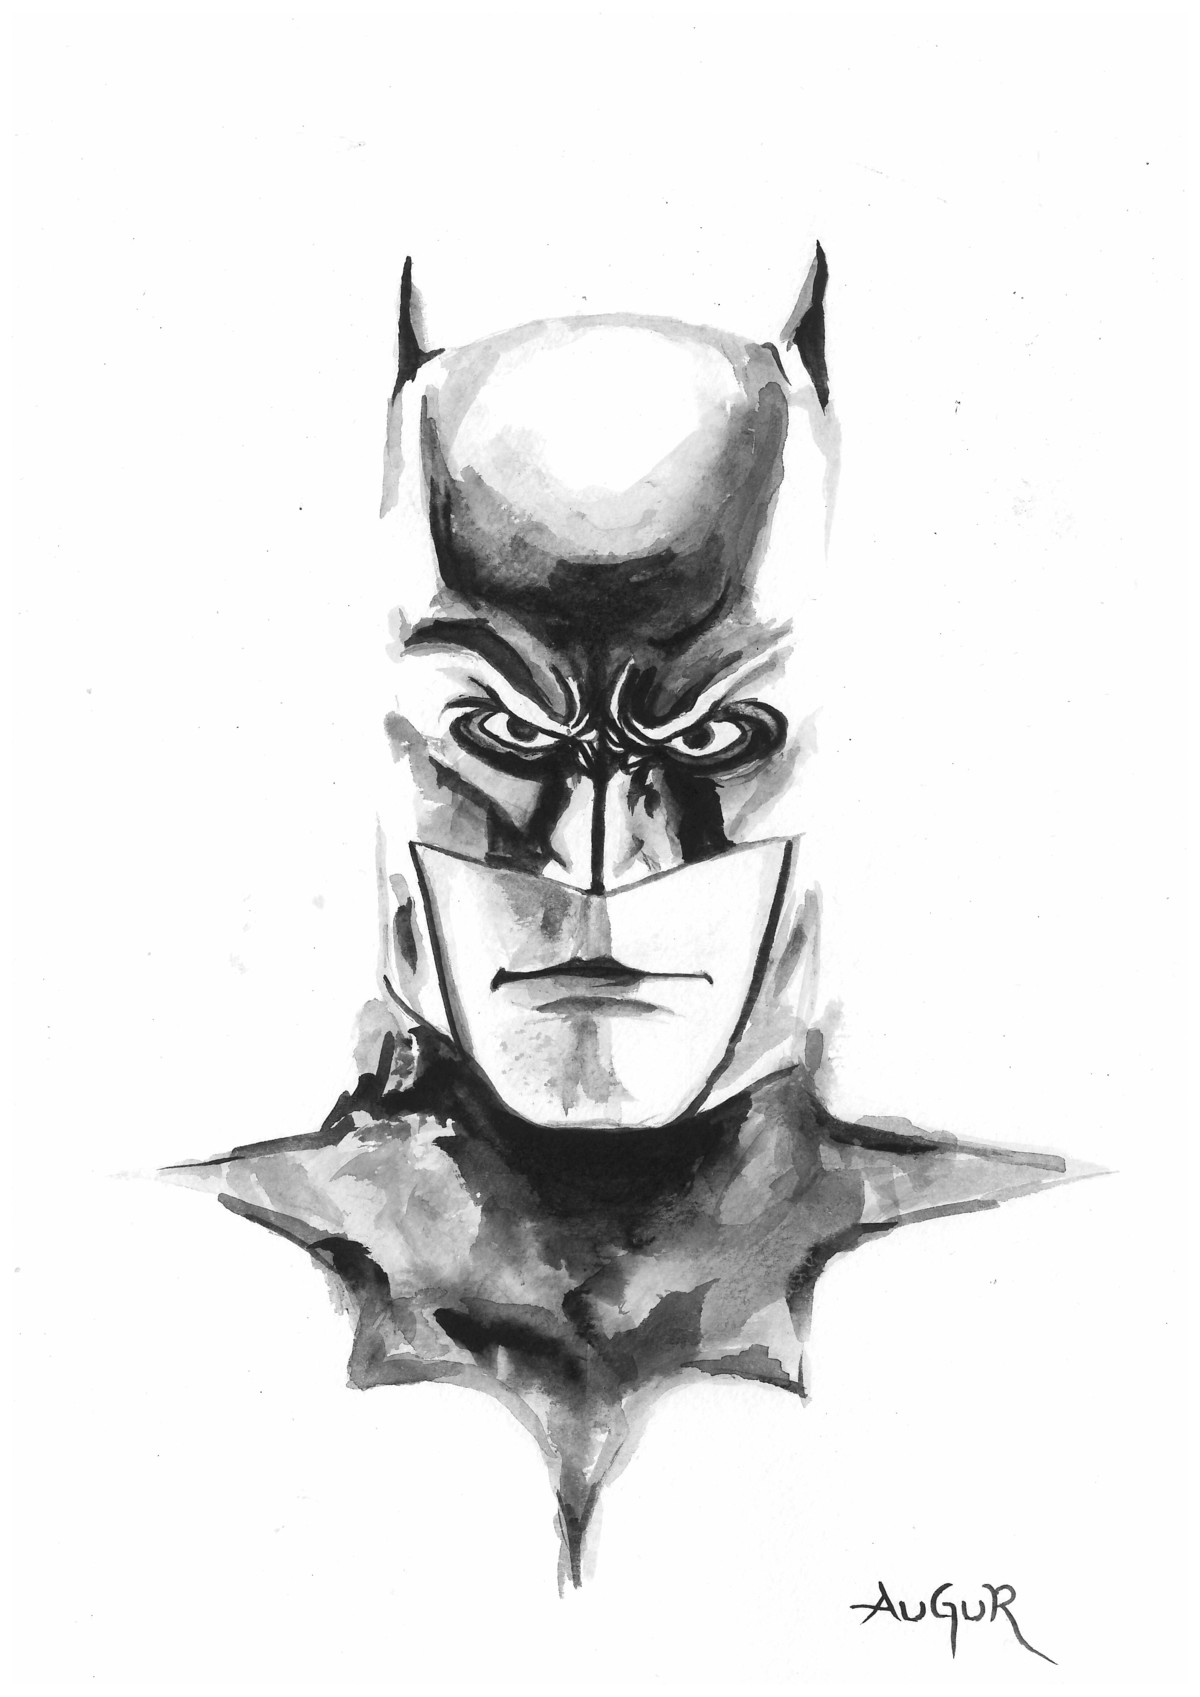 Batman by Augur, Illustration Painting, Watercolor on Paper, White color